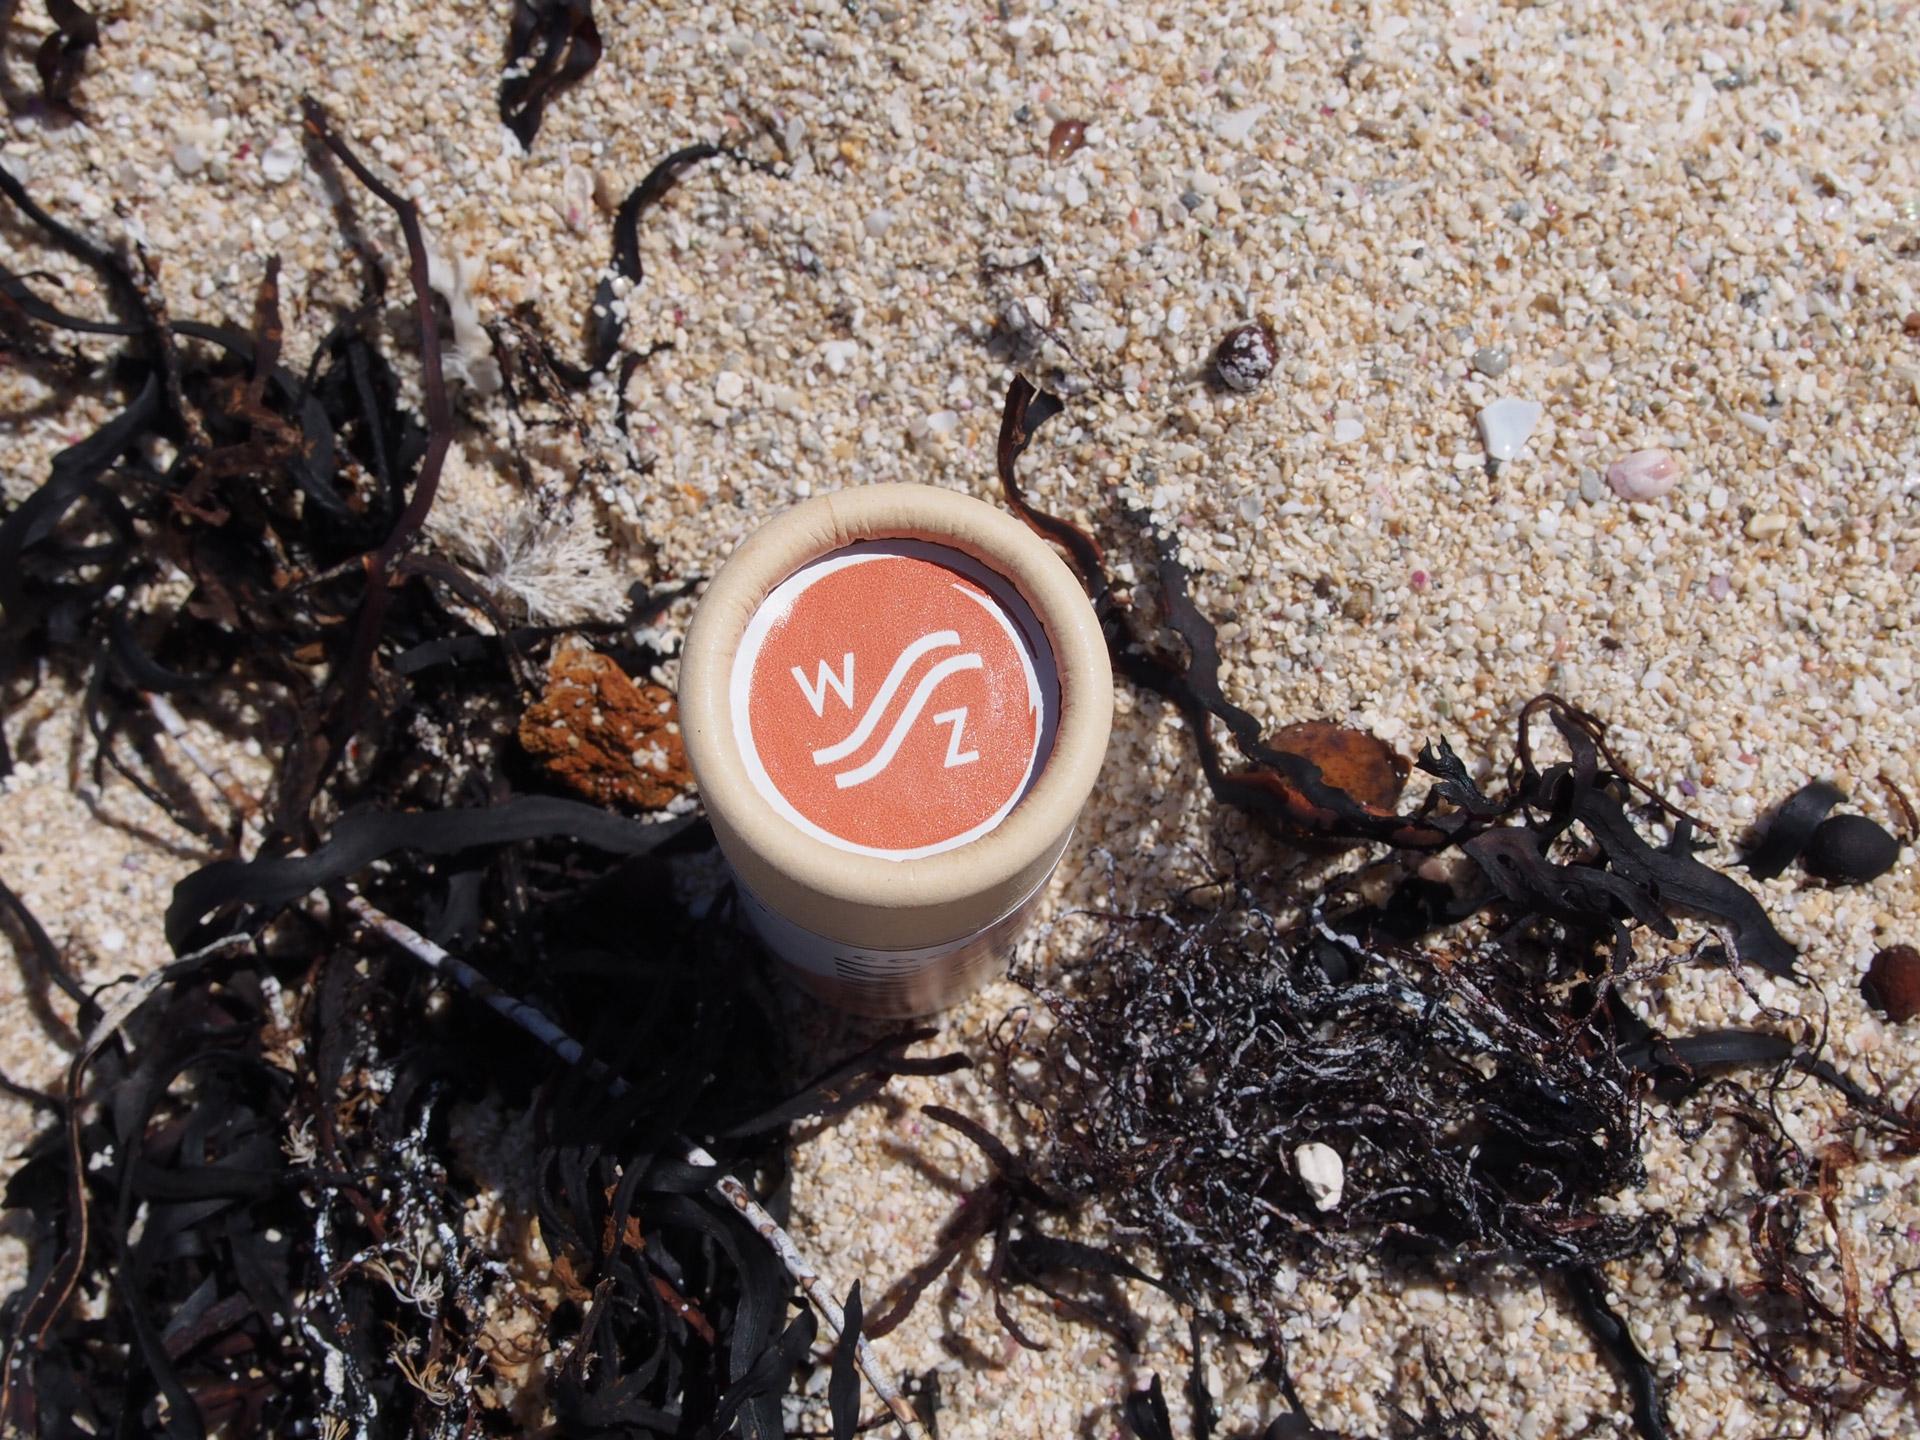 Winki-Zinc-Brand-Identity-logo-Design-Branding-Packaging-Studio-Mimi-Moon-1